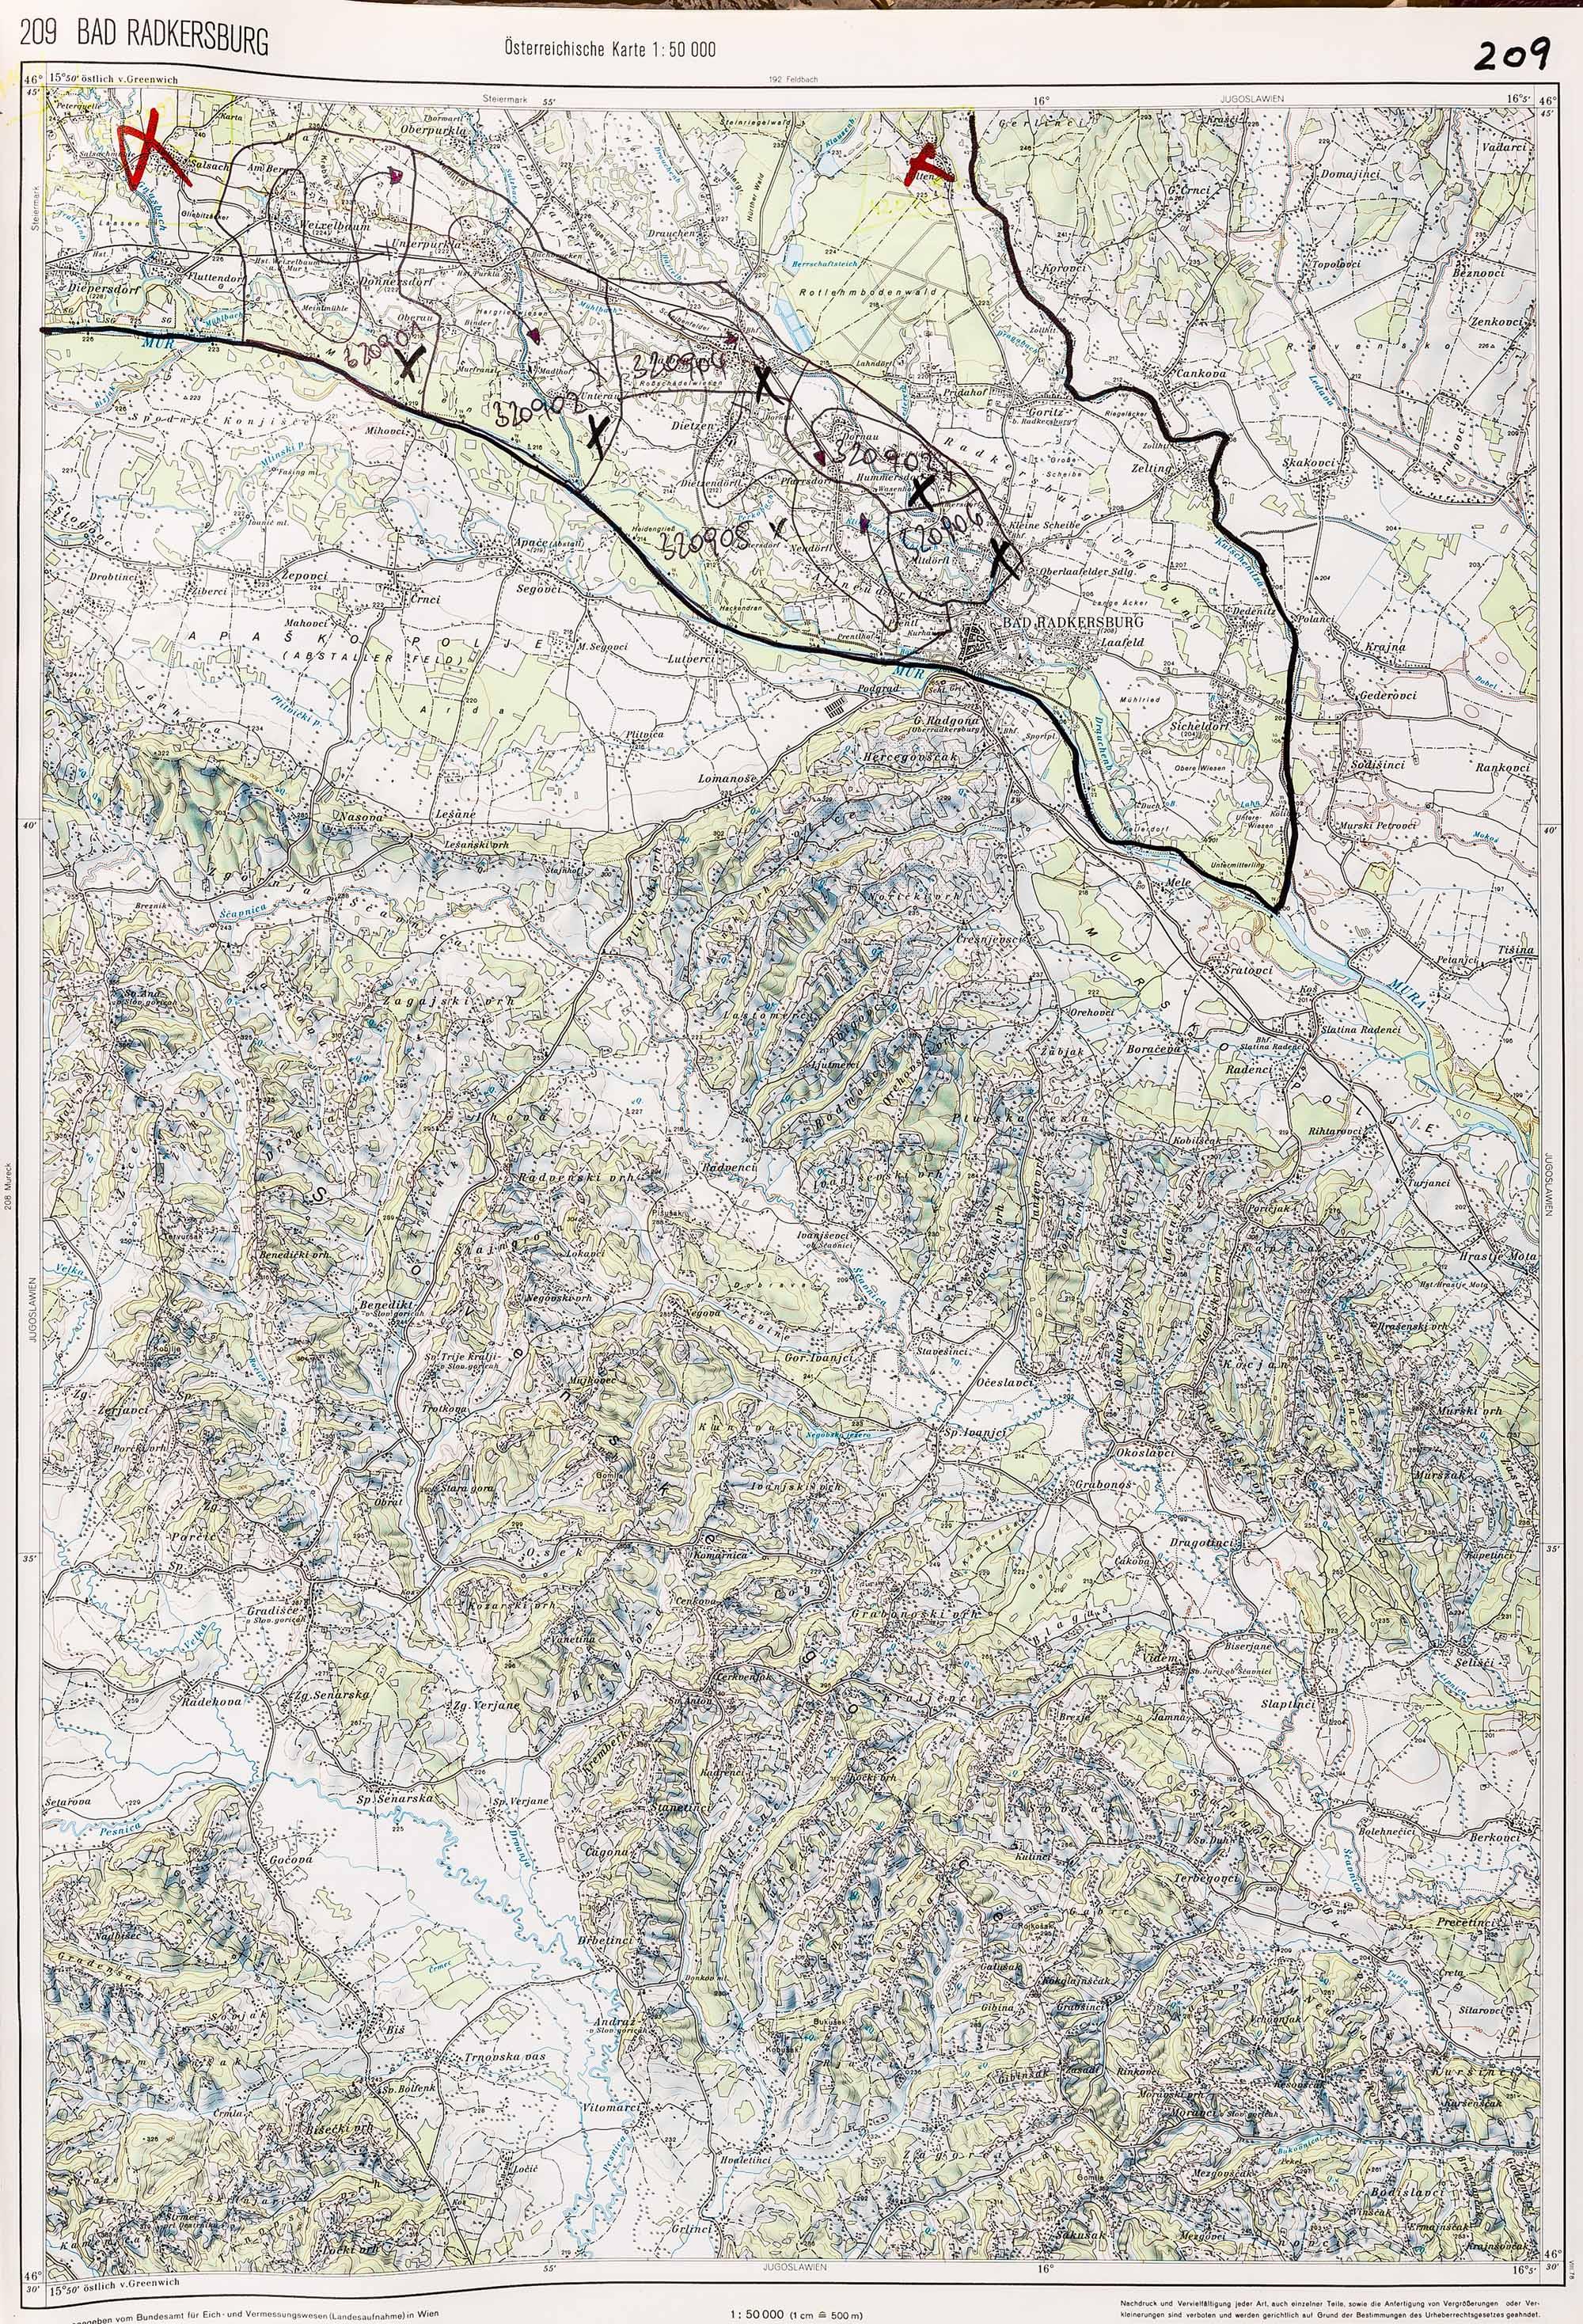 1983-1986 Karte 209